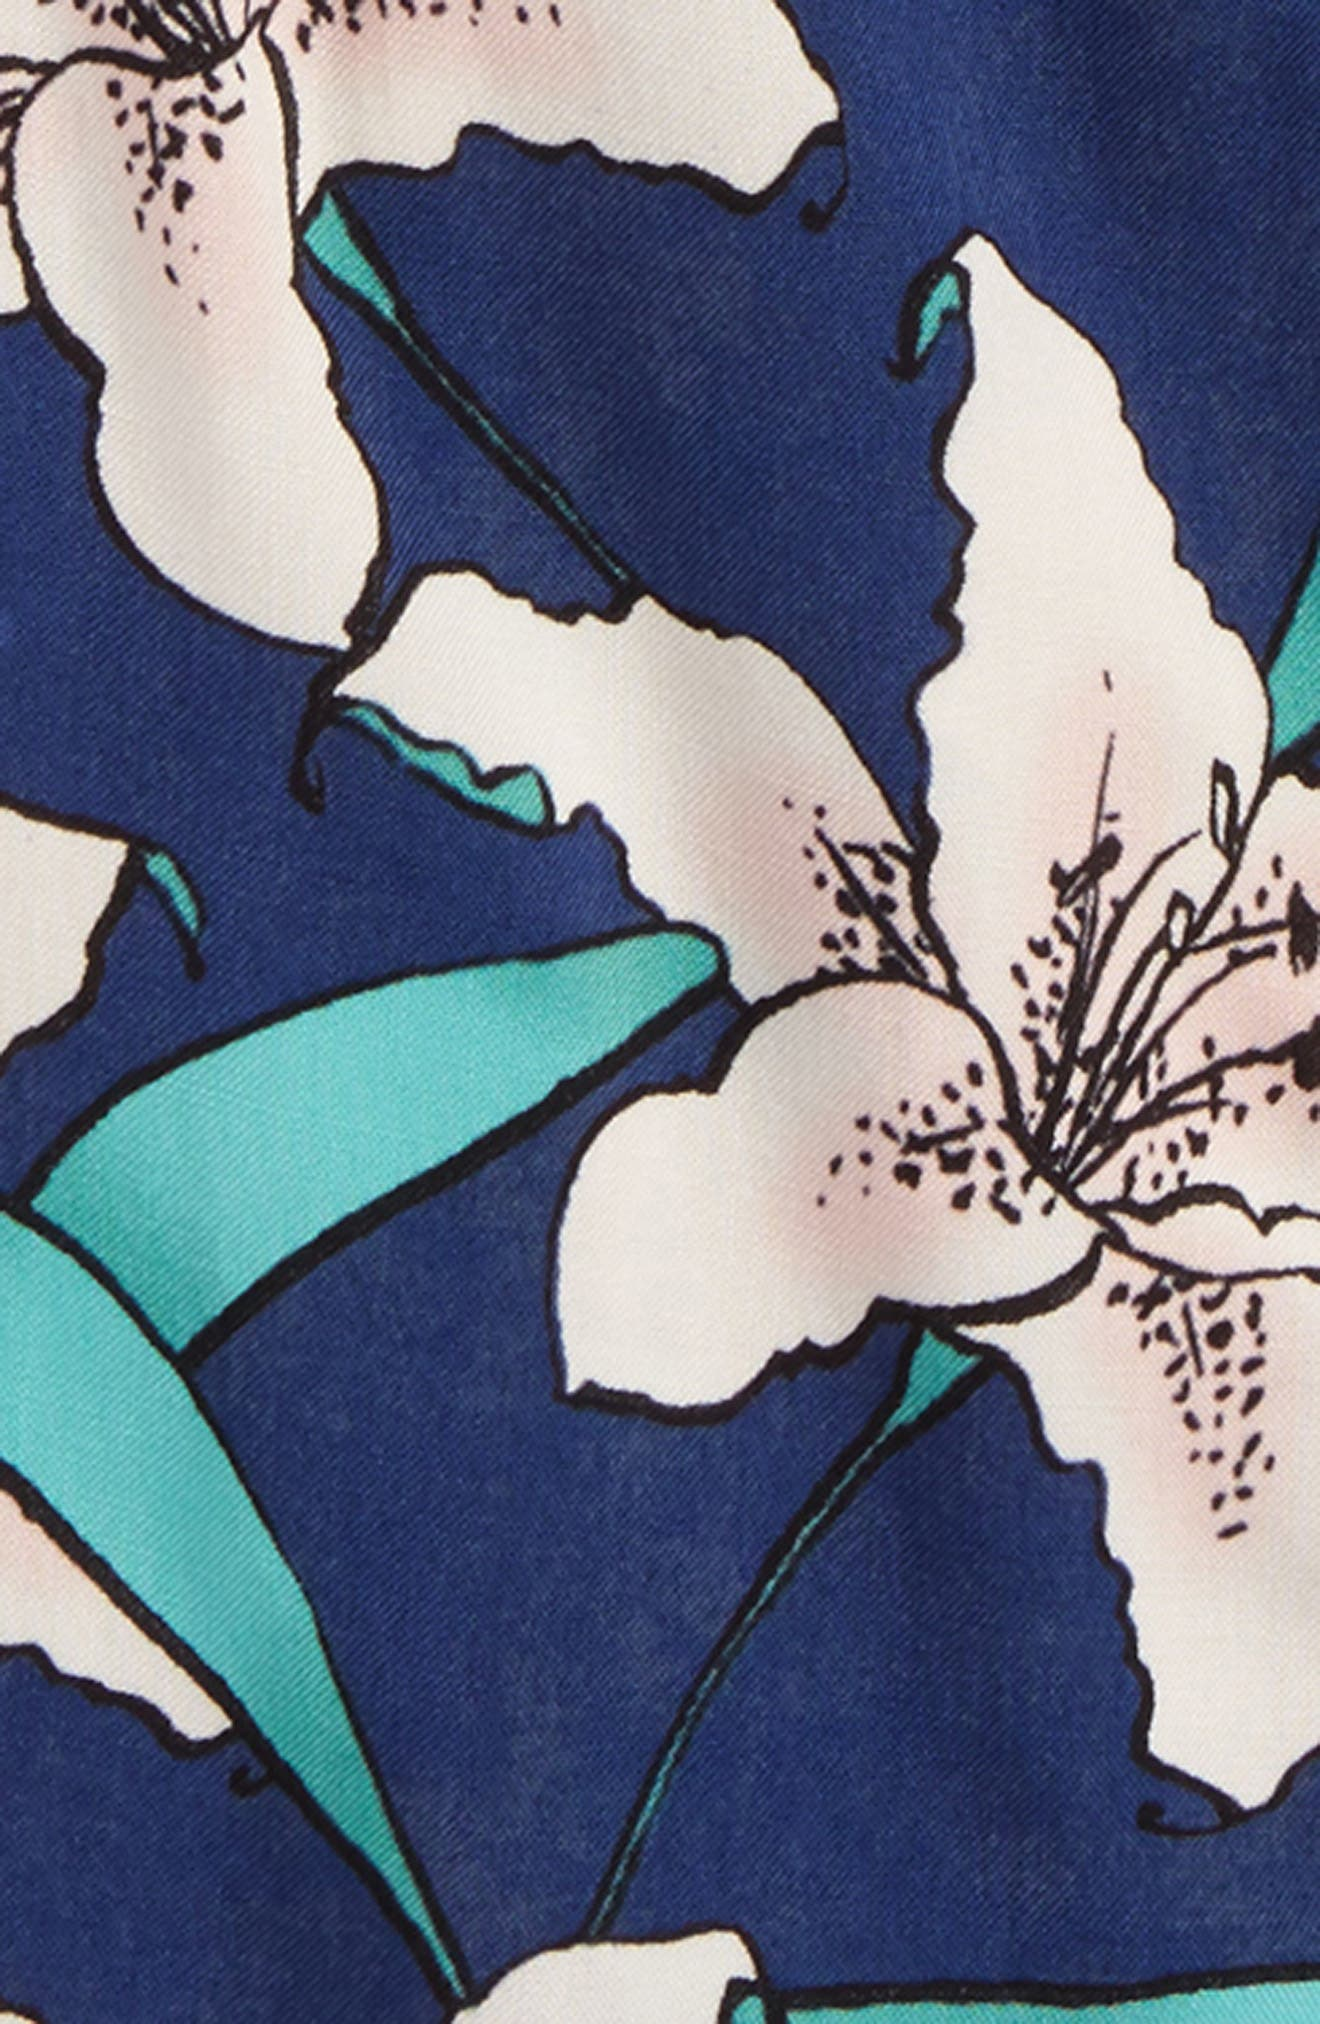 Cooper Woven Cold Shoulder Top,                             Alternate thumbnail 2, color,                             ESTATE BLUE